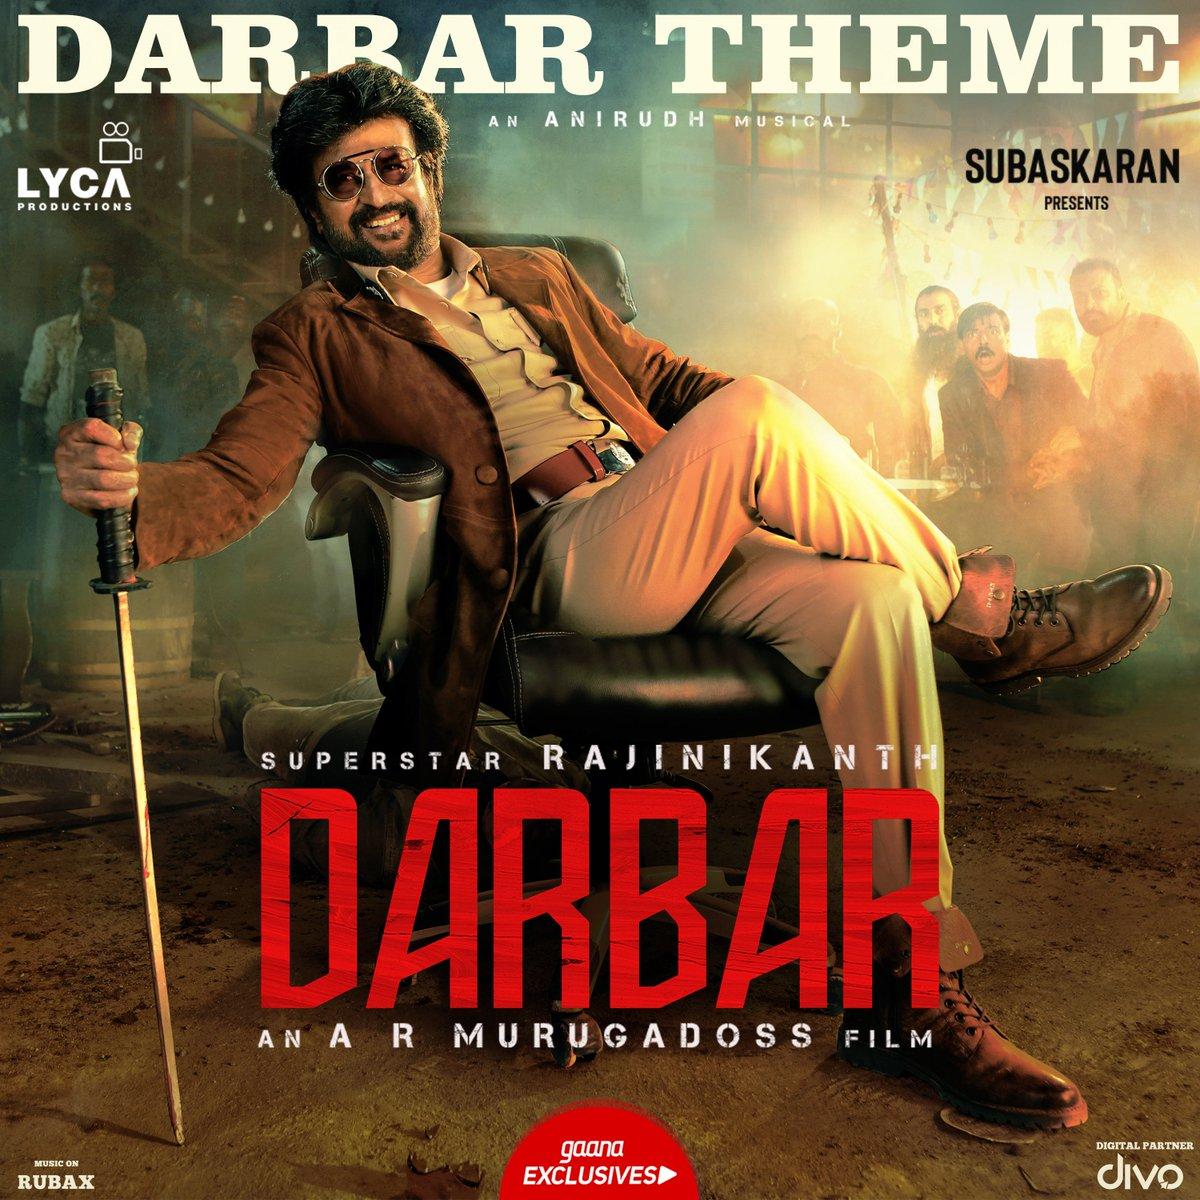 DARBAR Tamil Motion Poster Starring Rajinikanth Directed by A.R. Murugadoss